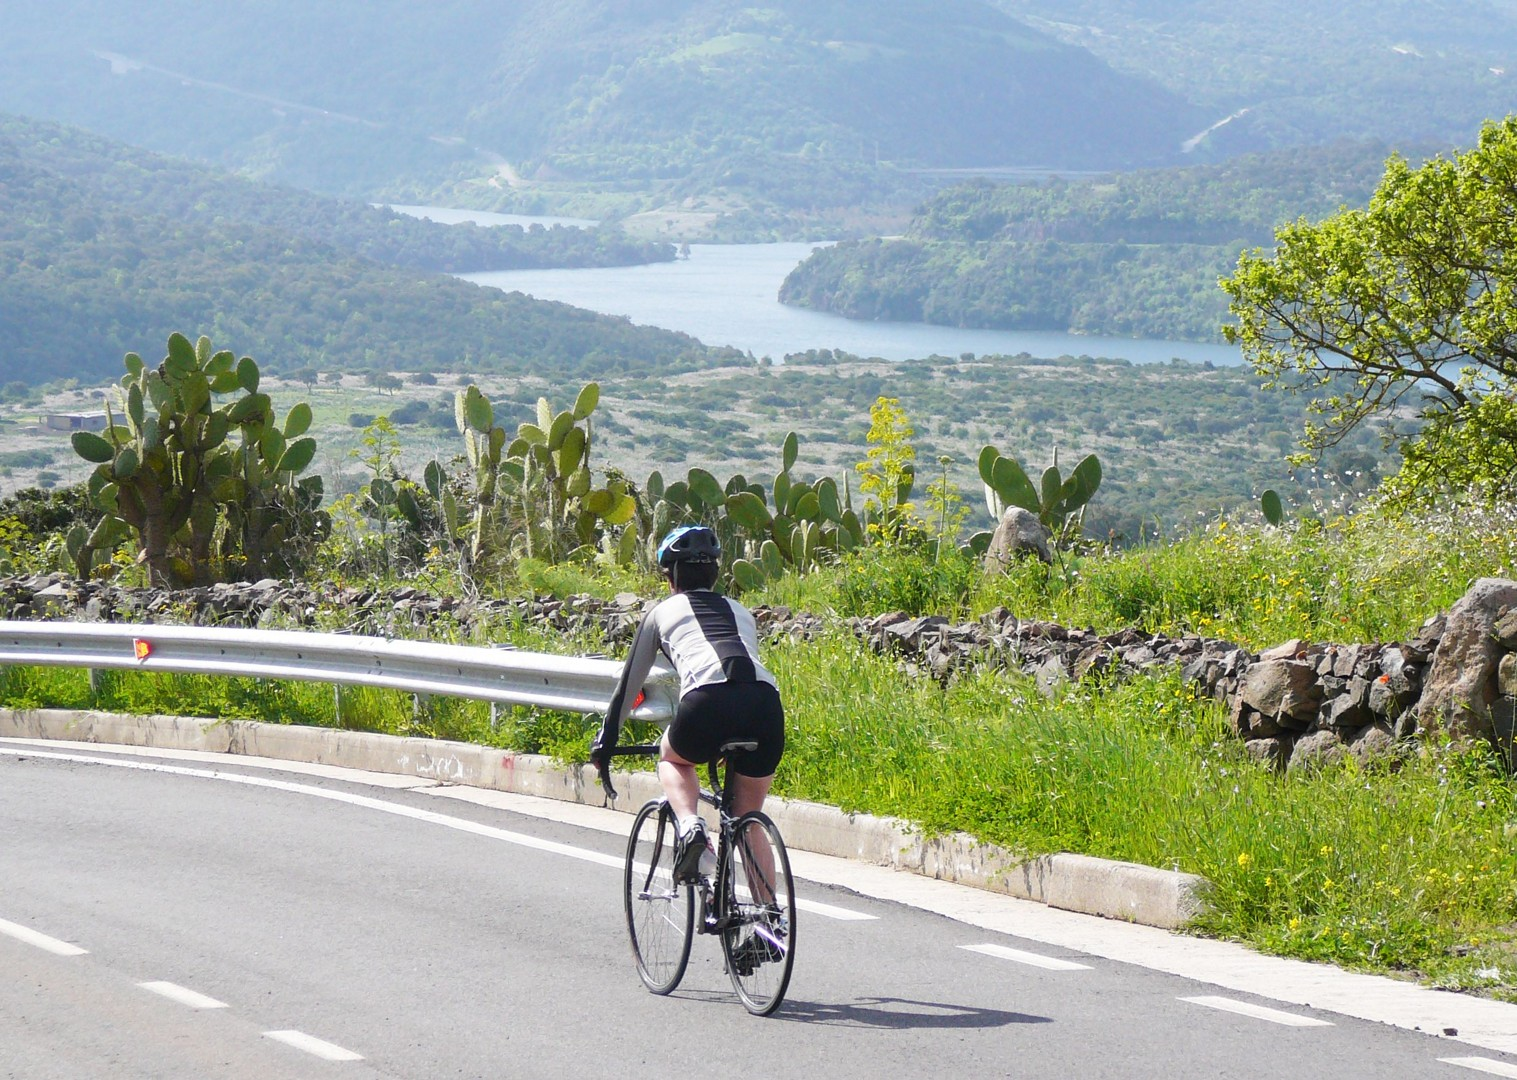 Sardinia-Coastal-Explorer-Guided-Road-Cycling-Holiday.JPG - Italy - Sardinia - Coastal Explorer - Road Cycling